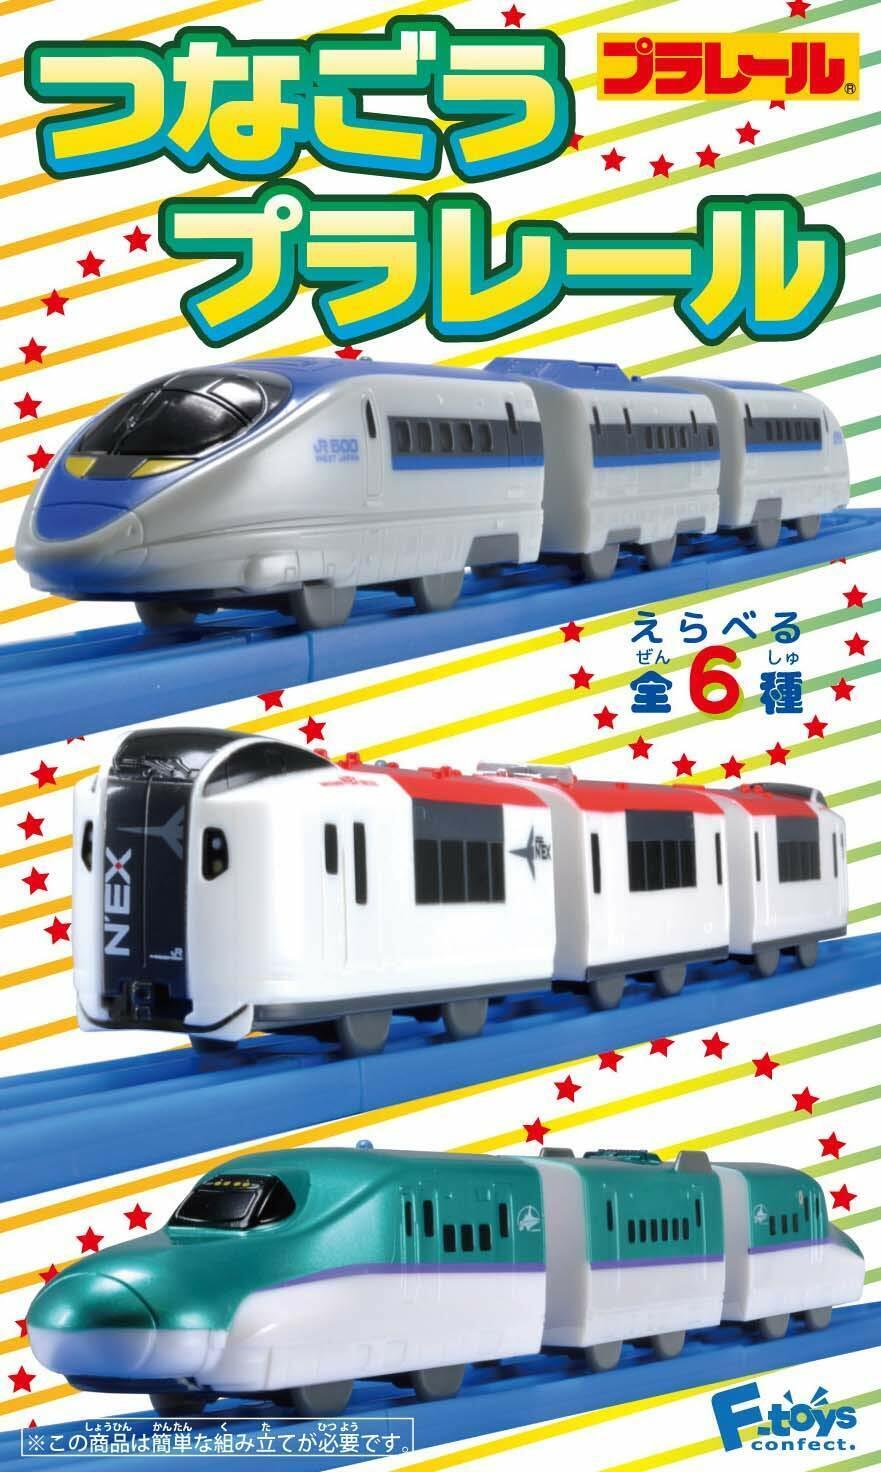 Tsunagu Plarail 3 10 pieces Candy Toys & Gums (Plarail) From Japan